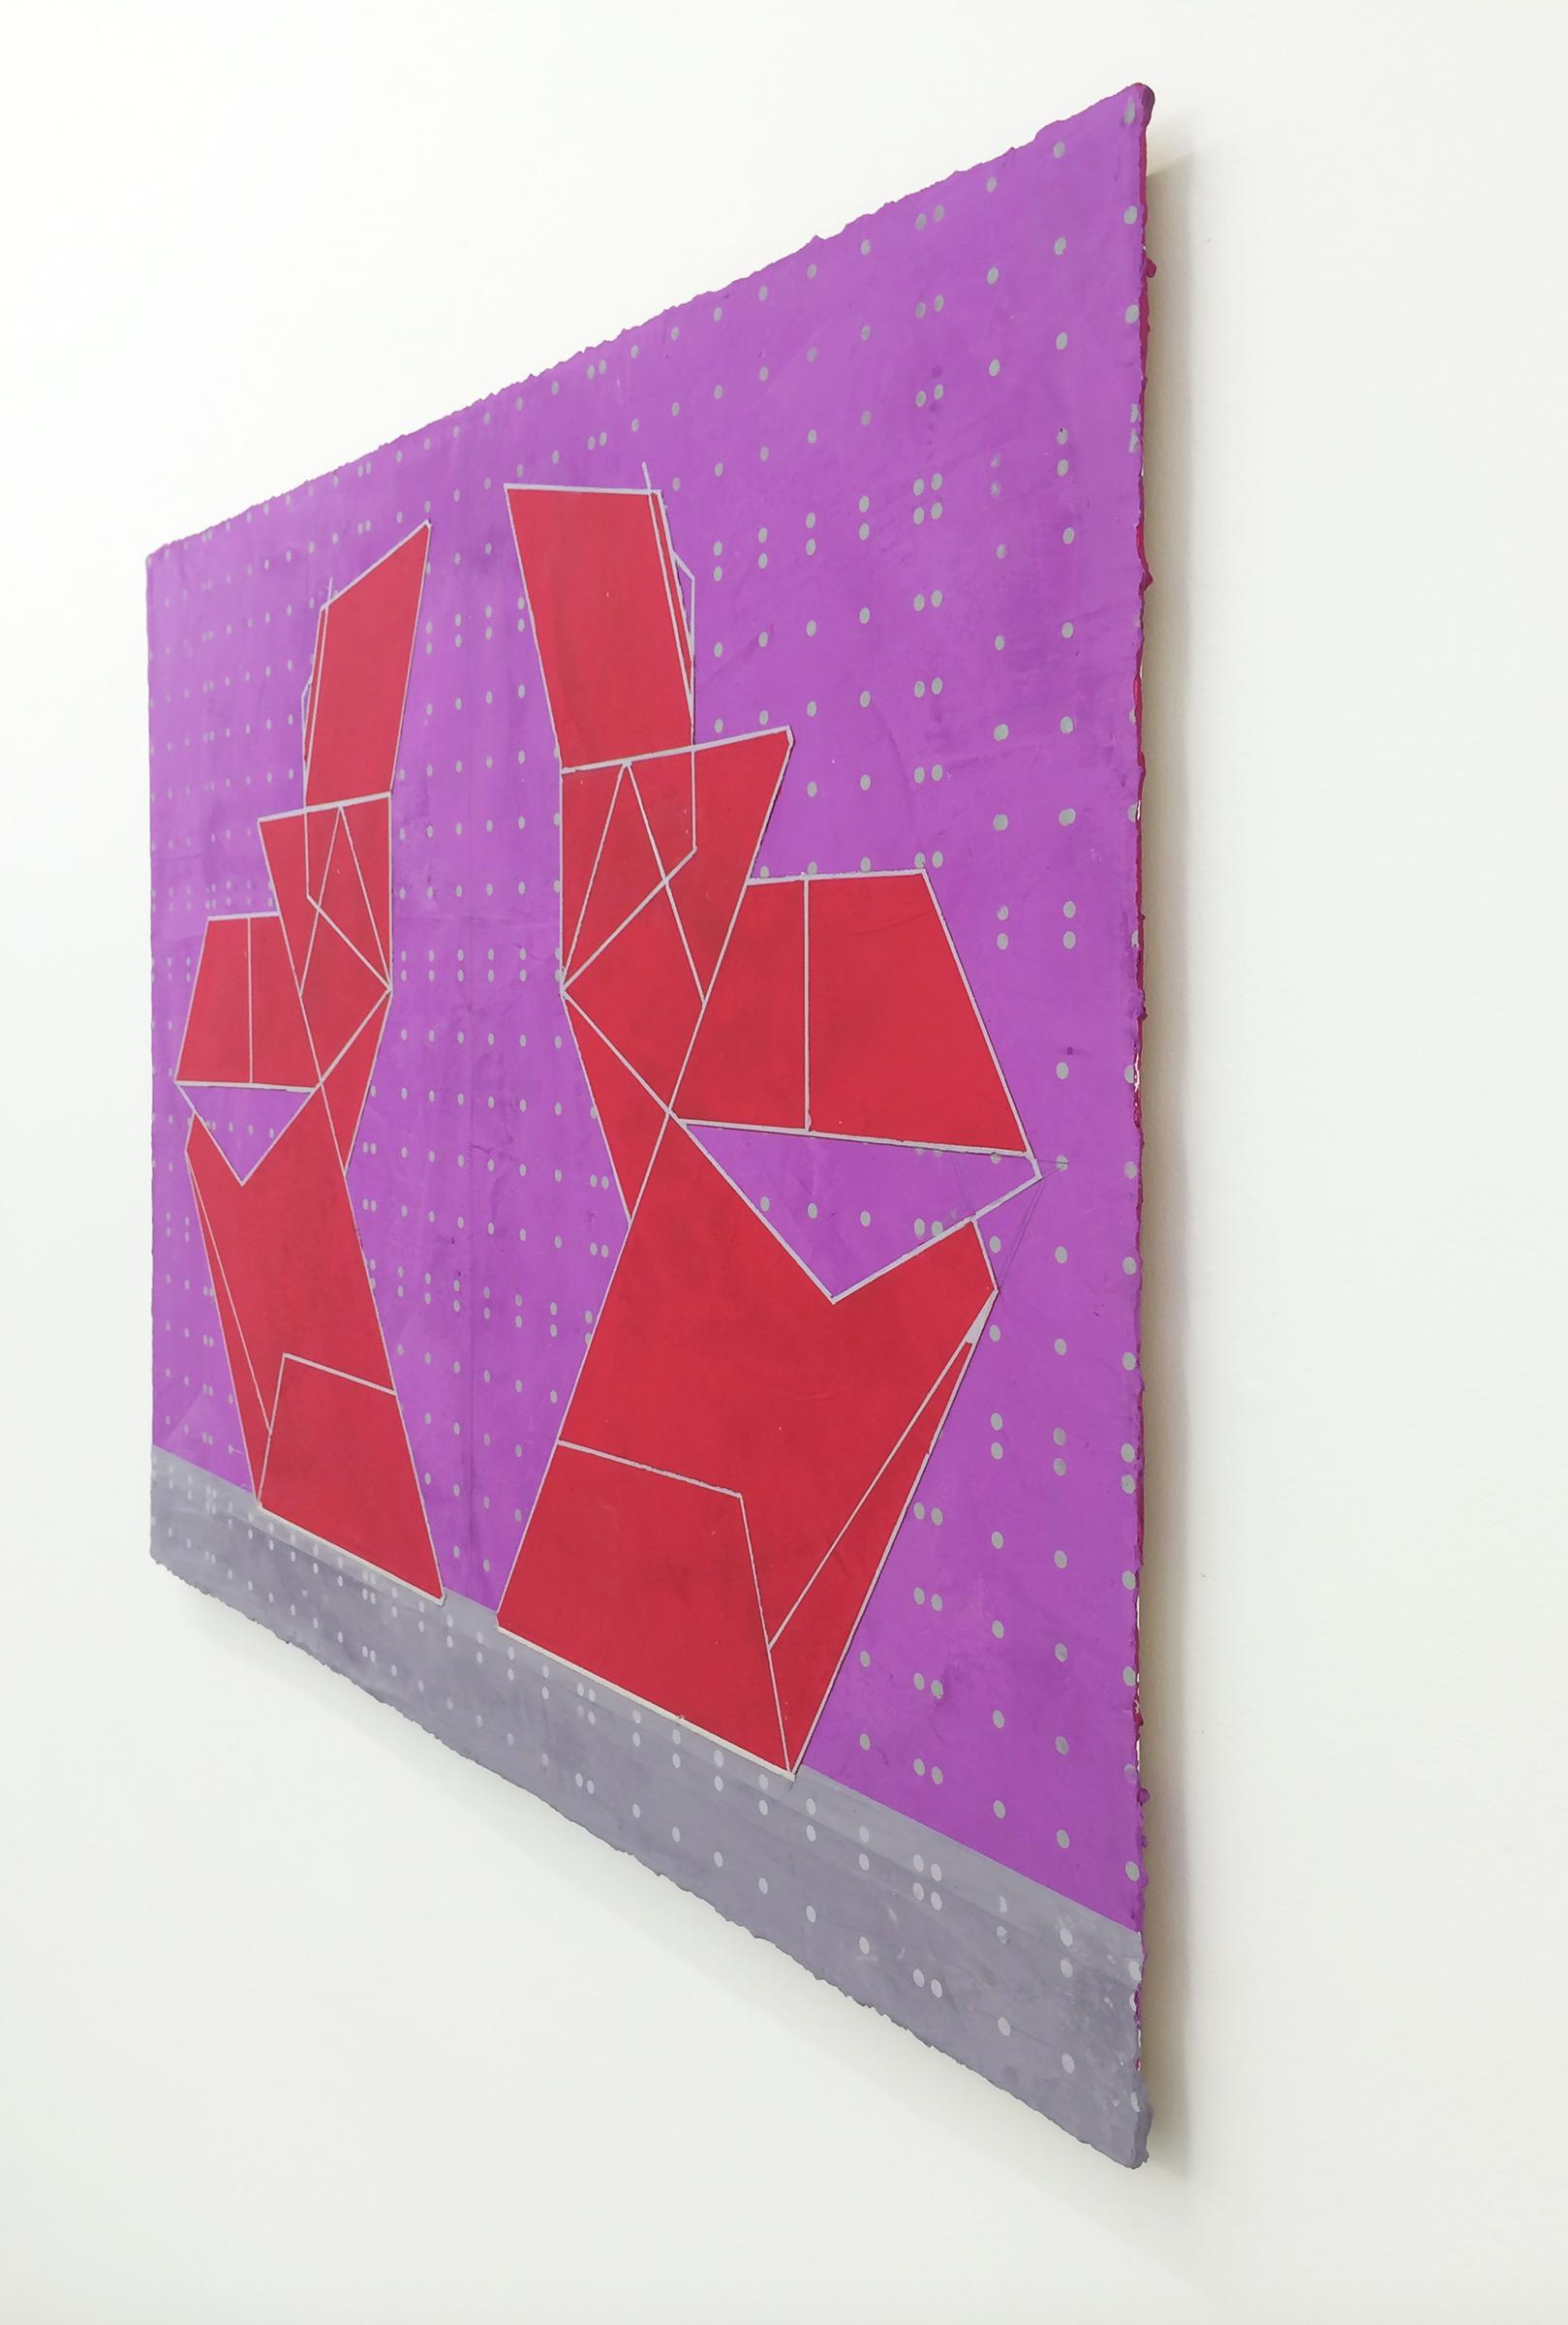 "ELISE FERGUSON  (profile) Tropic , 2016, pigmented plaster on panel, 30"" x 40"""